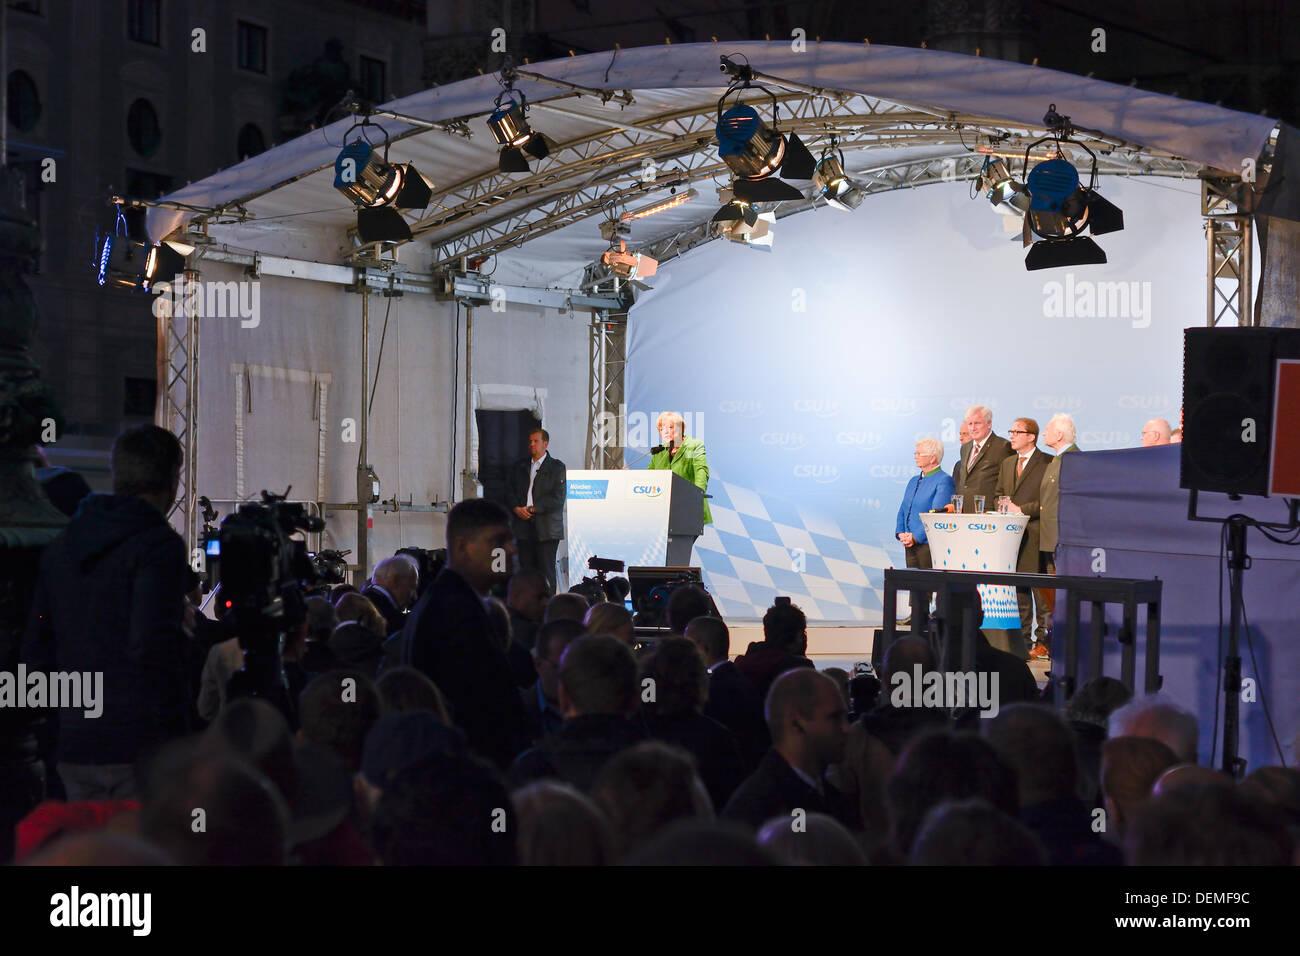 Munich, Germany. 20th September 2013. Chancellor Angela Merkel and CSU Chef Horst Seehofer campaigning on the Odeonsplatz in Munich Credit:  Steven Jones/Alamy Live News - Stock Image